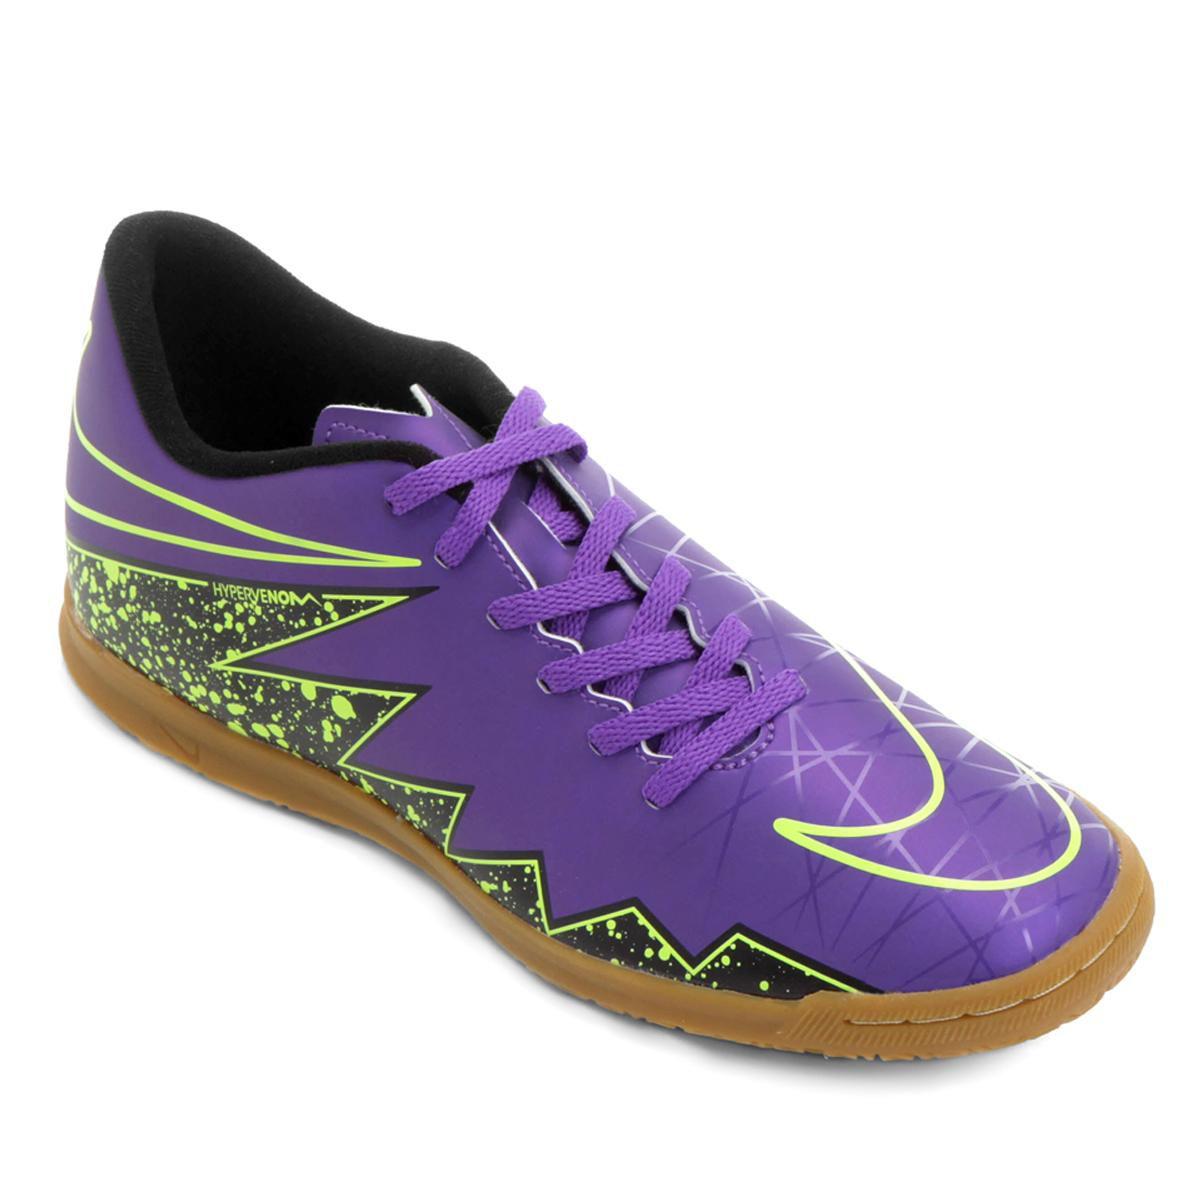 8130292b19f40 Chuteira Futsal Nike Hypervenom Phade 2 IC Masculina Roxo Preto